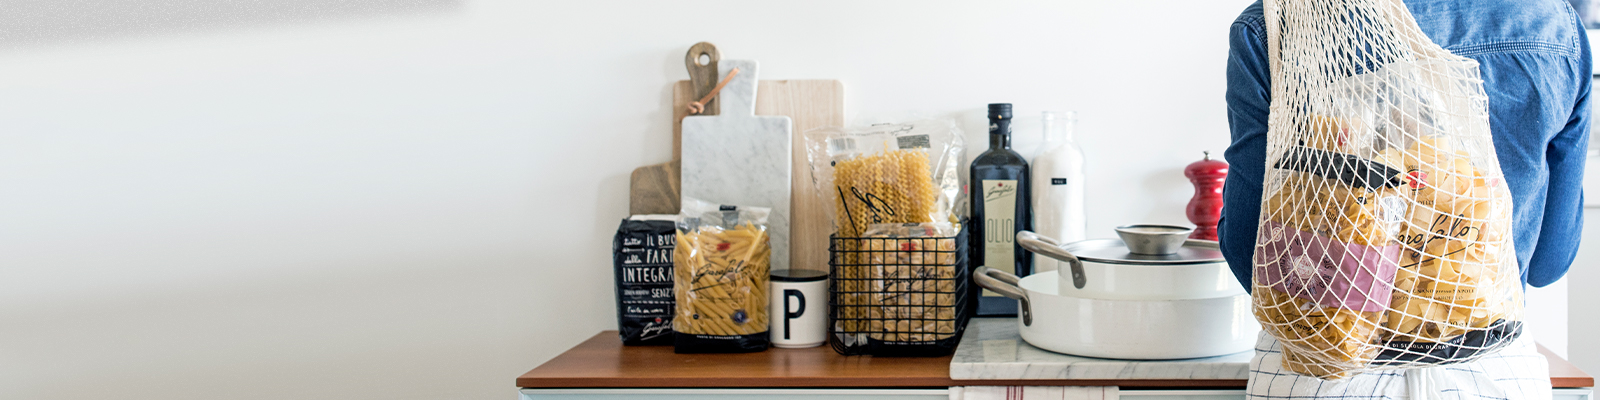 Pasta Garofalo - Puntos de venta